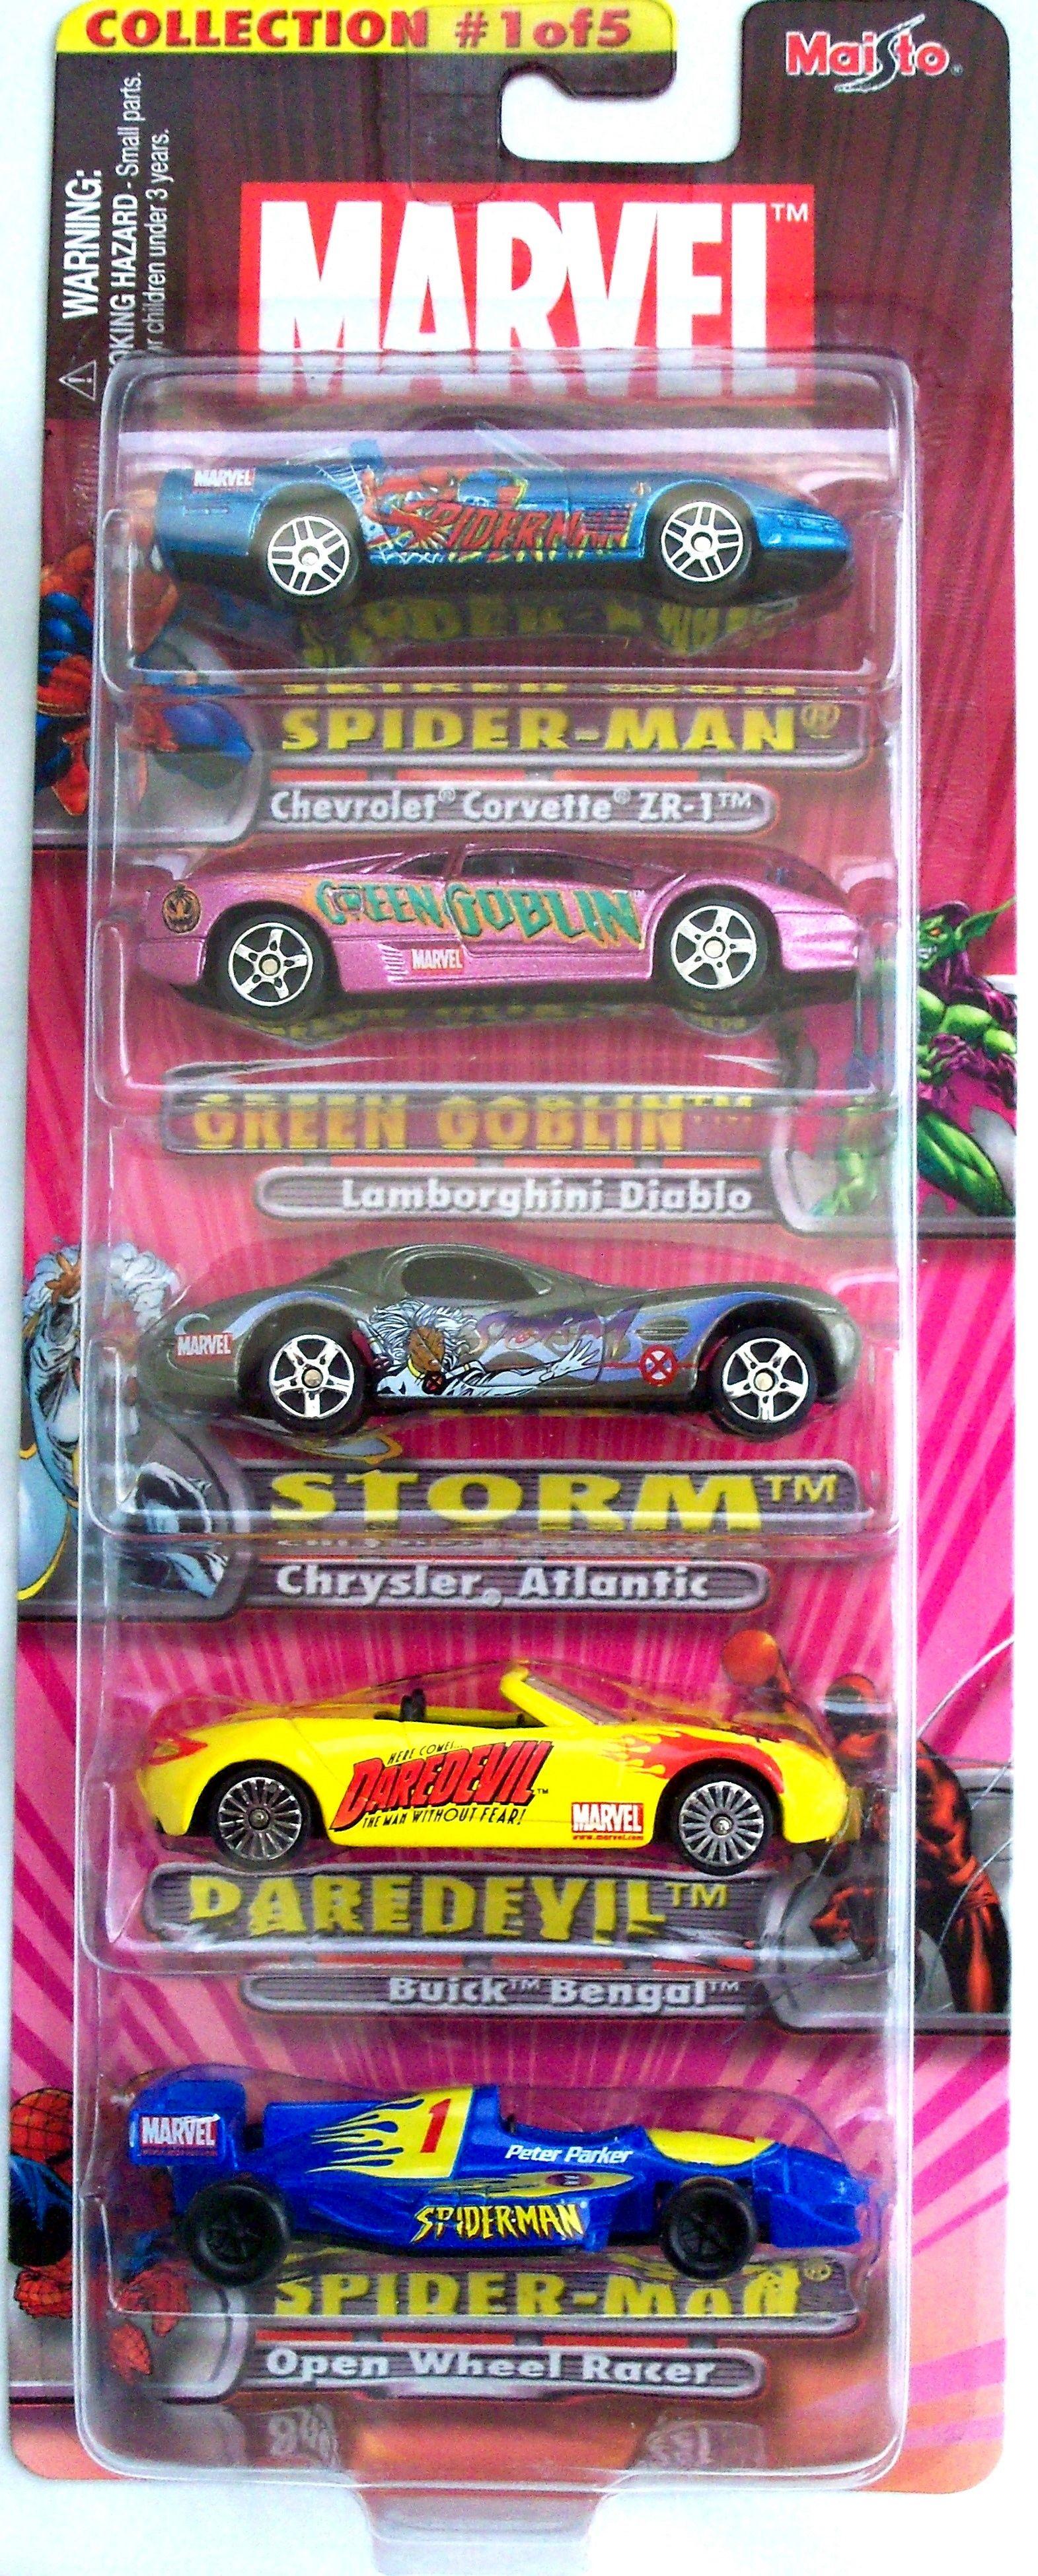 2002 Marvel Die Cast Car Set Collection 1 Of 5 Maisto Diecast Car Set Diecast Cars